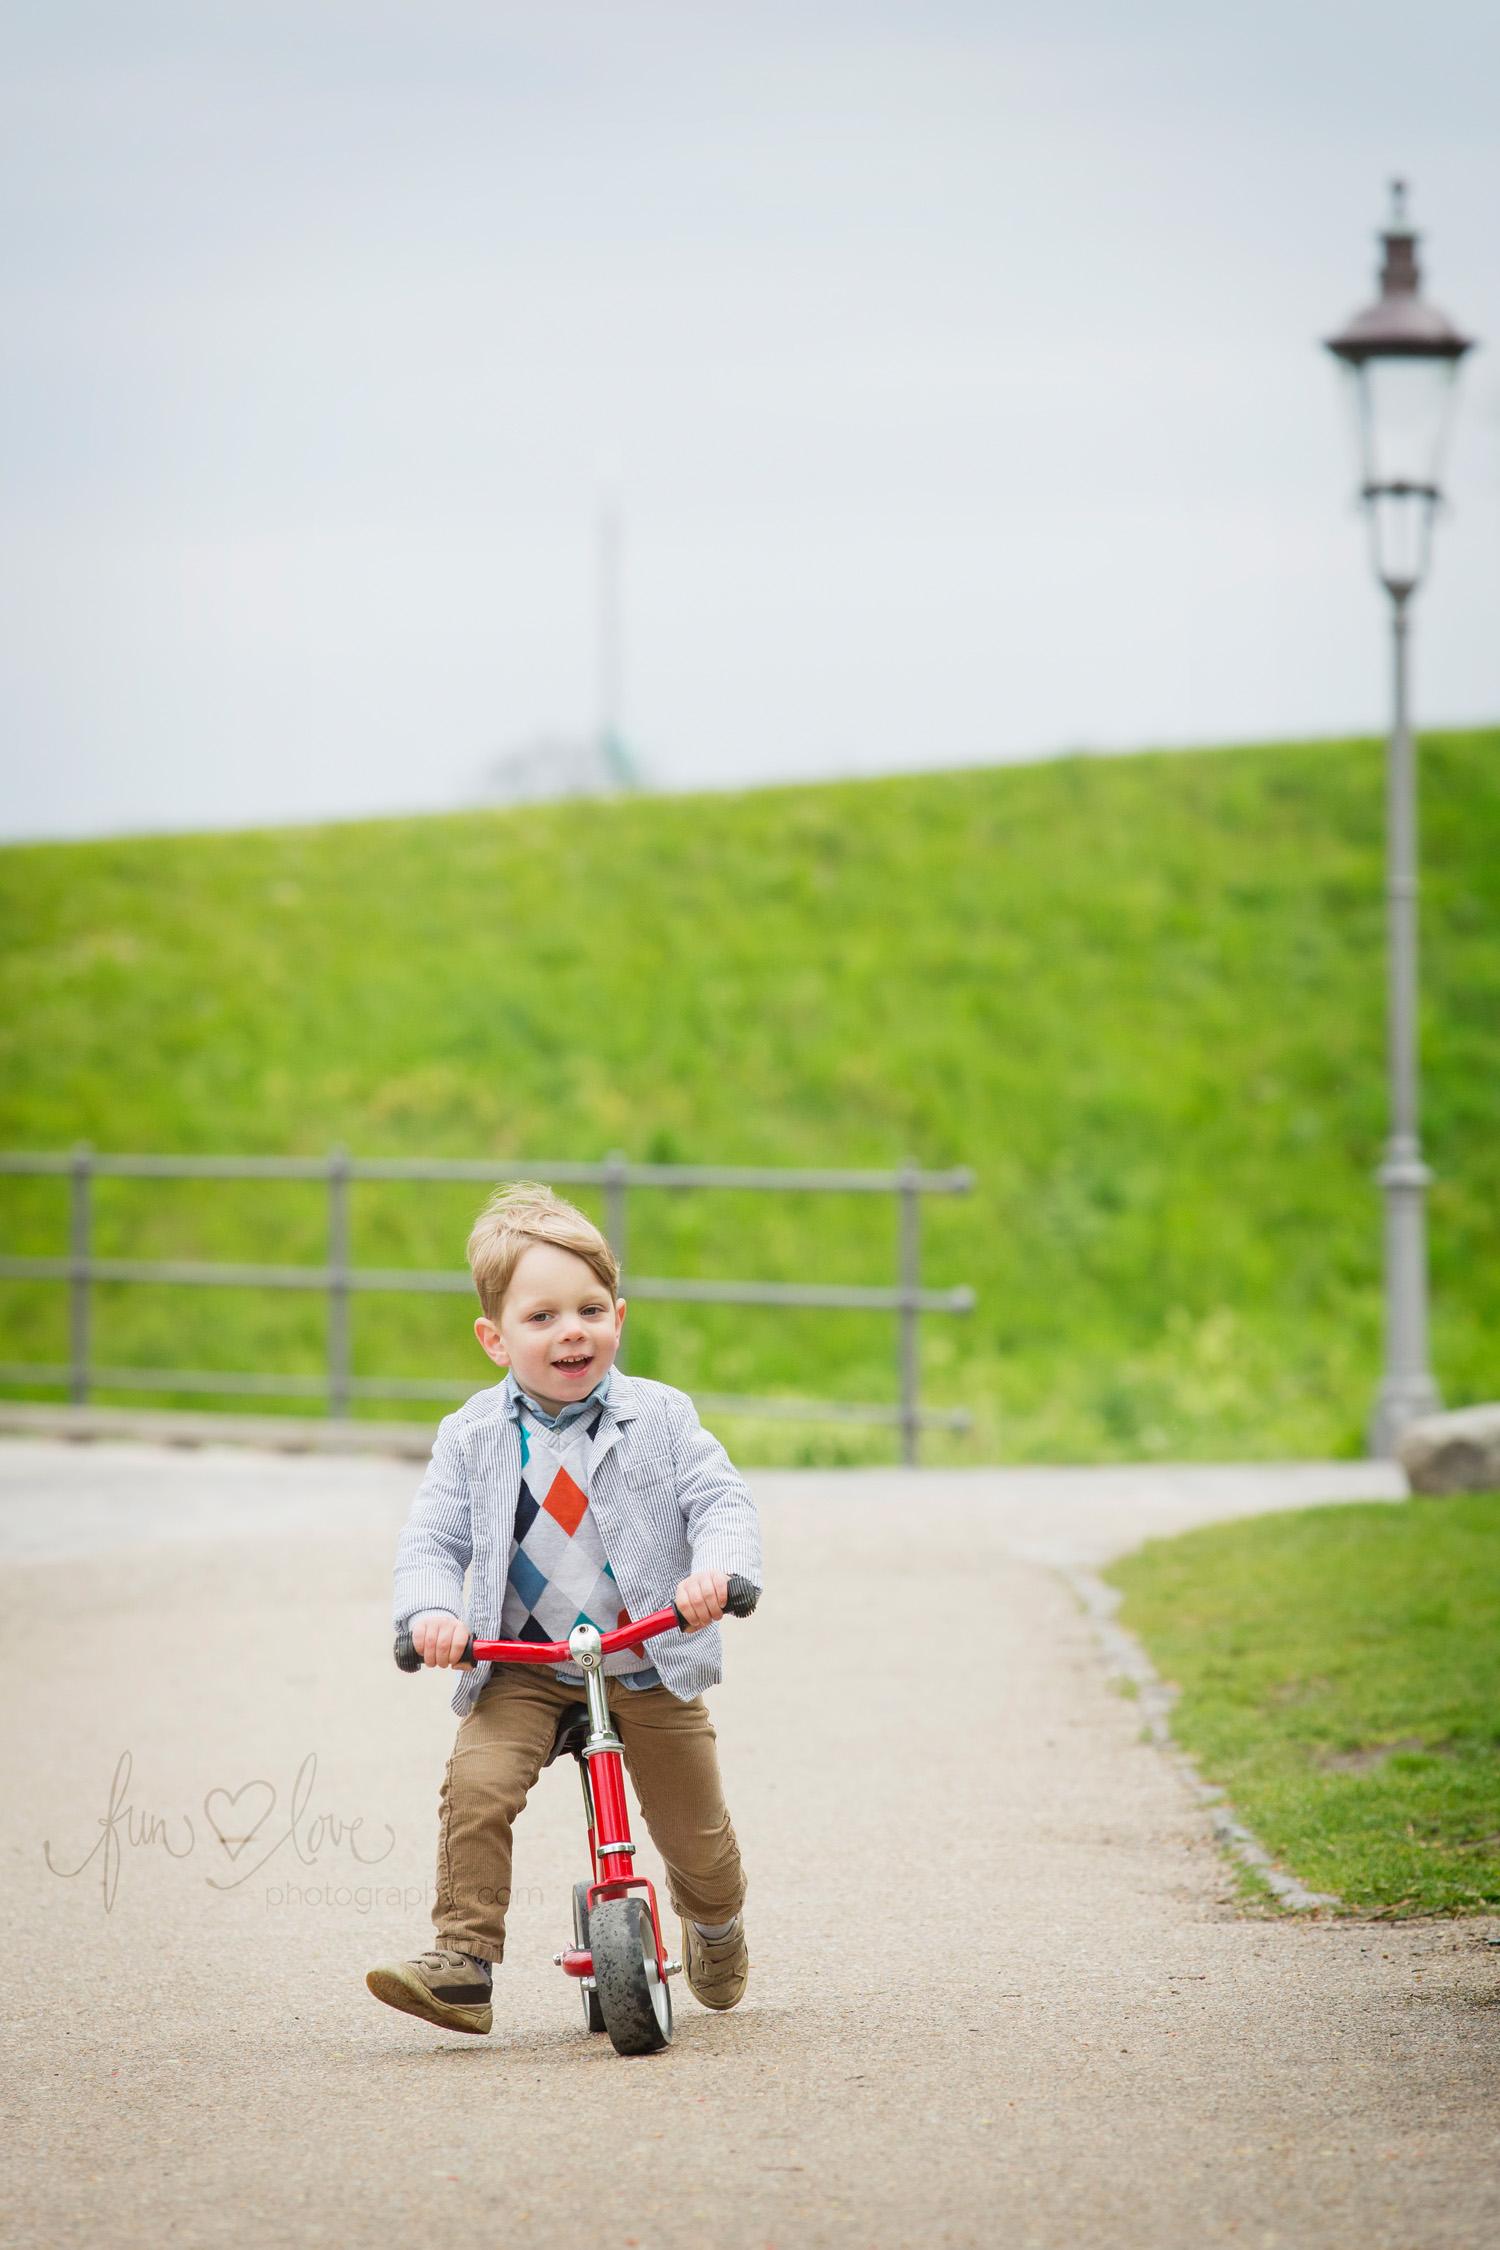 boy-on-balance-bike-toronto-child-photography